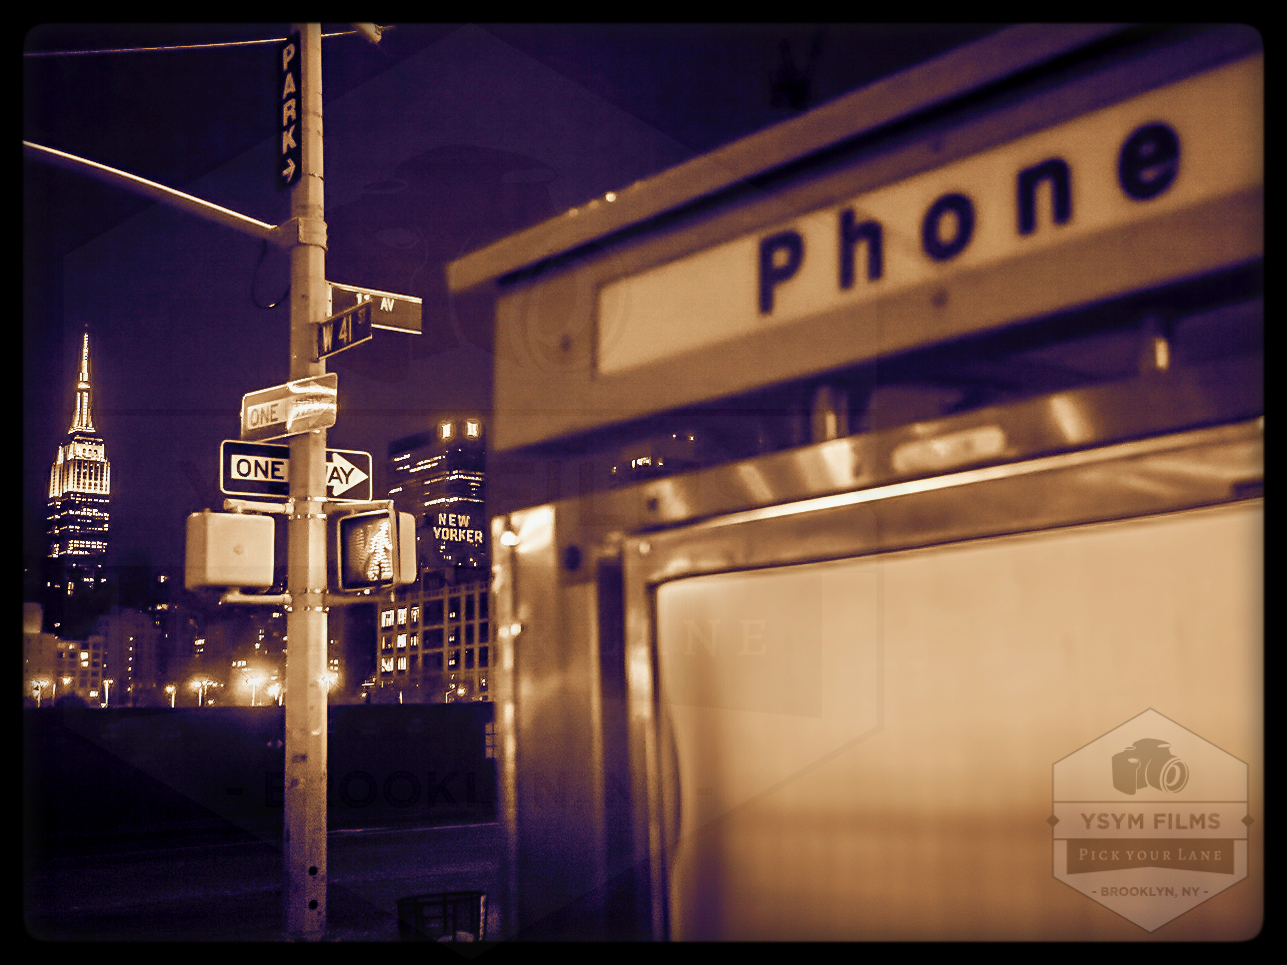 Pay Phone Newyorker the empire.jpg